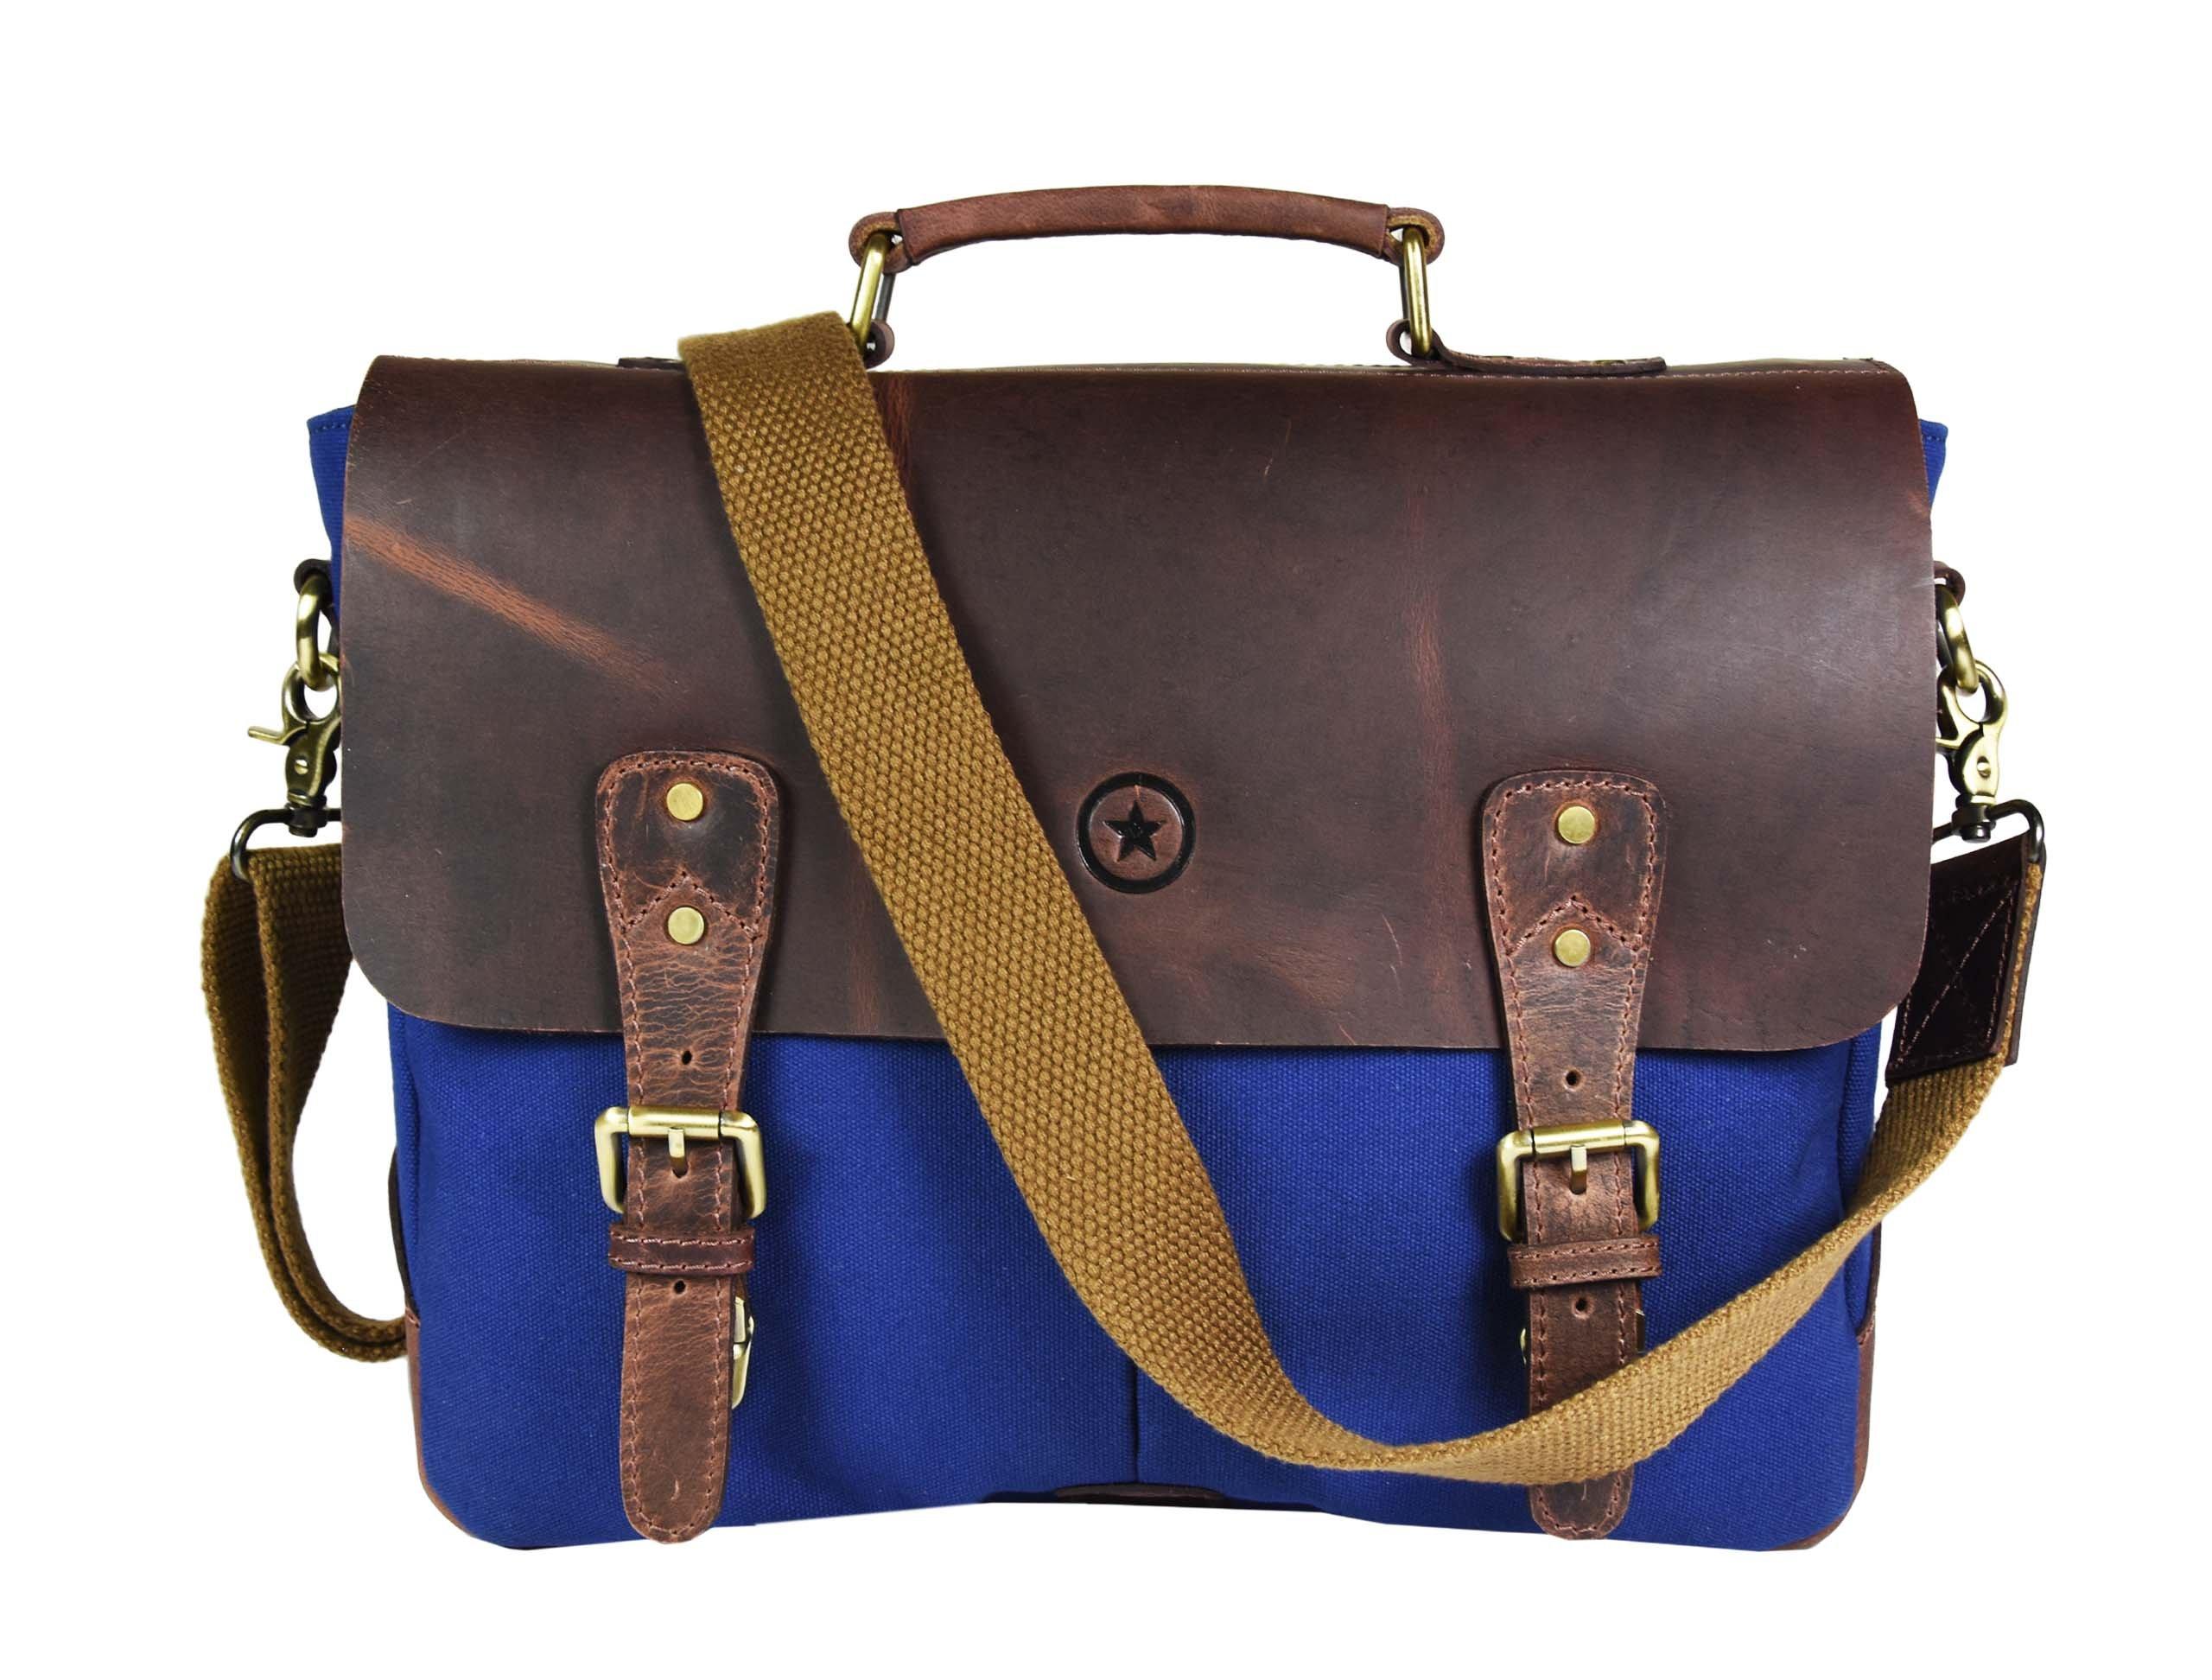 "14.5"" Vintage Handmade Leather Canvas Messenger Bag | Multiple Compartments Zippered Pockets Cross-Body Bag (Zaffre Blue)"